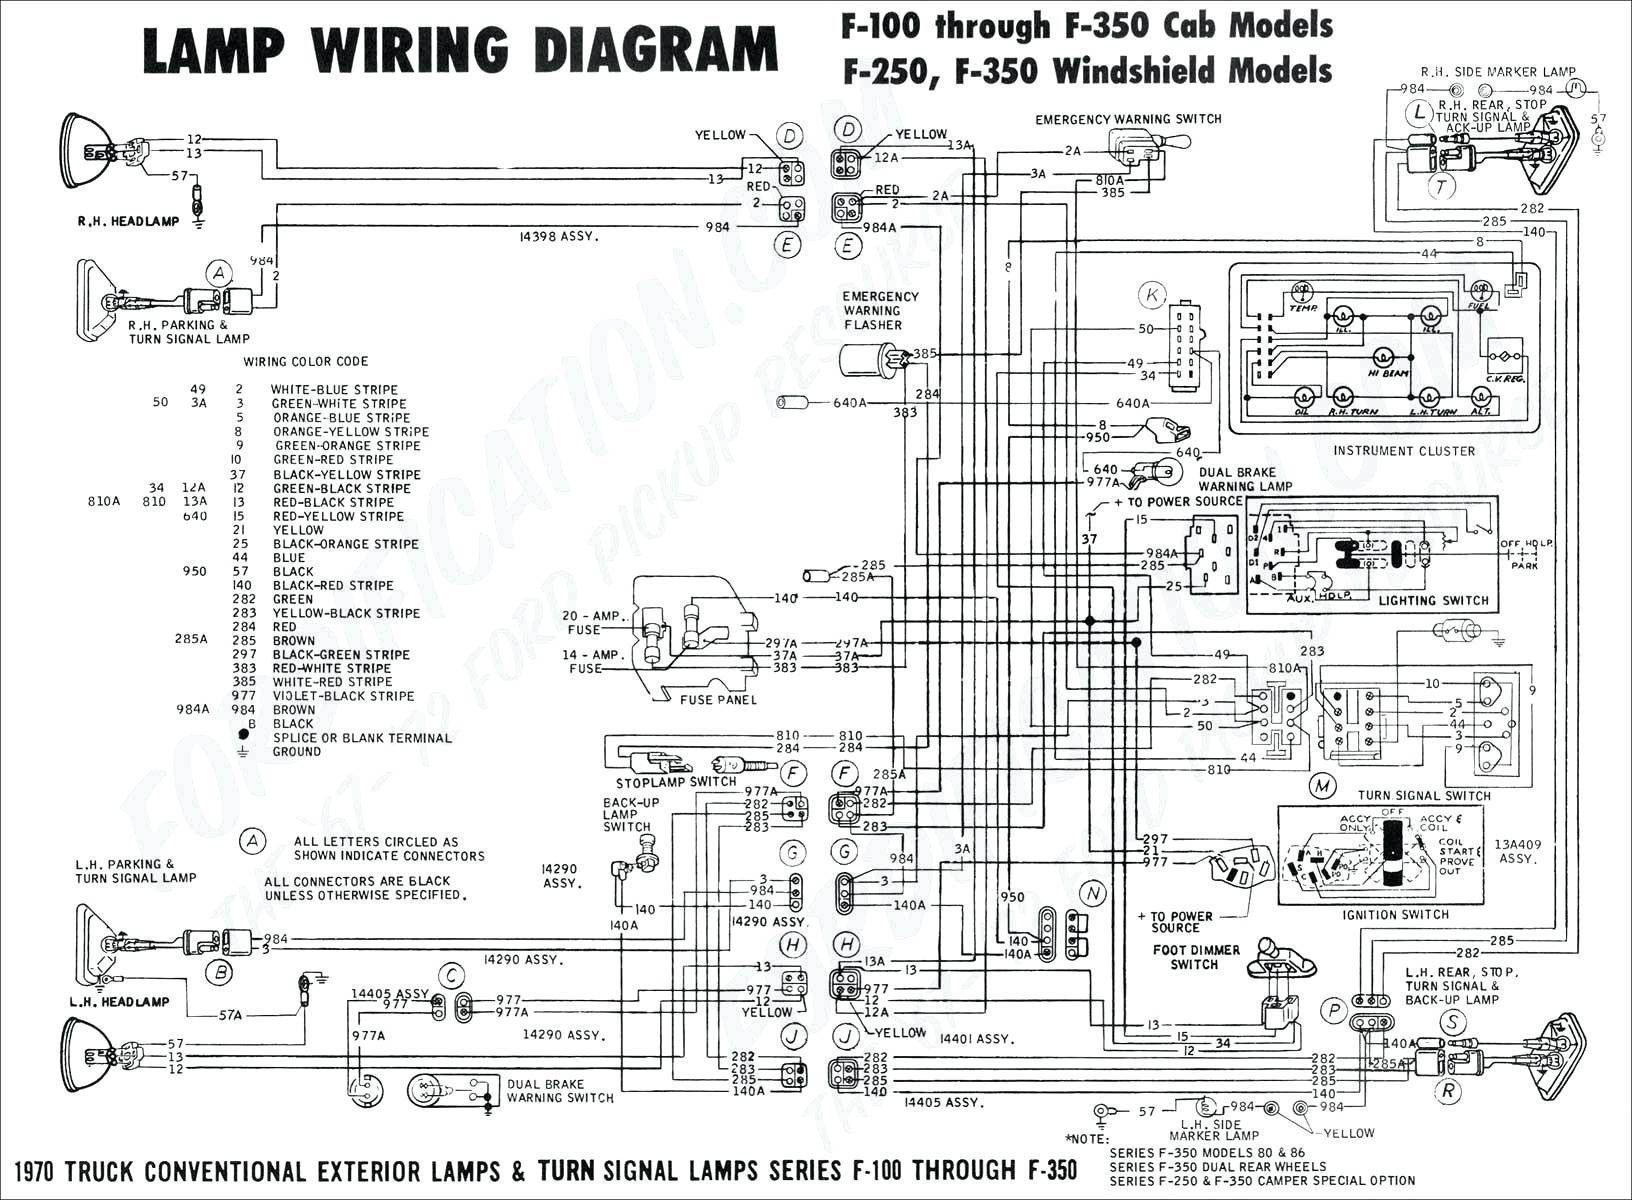 1985 Dodge W150 Wiring Diagram